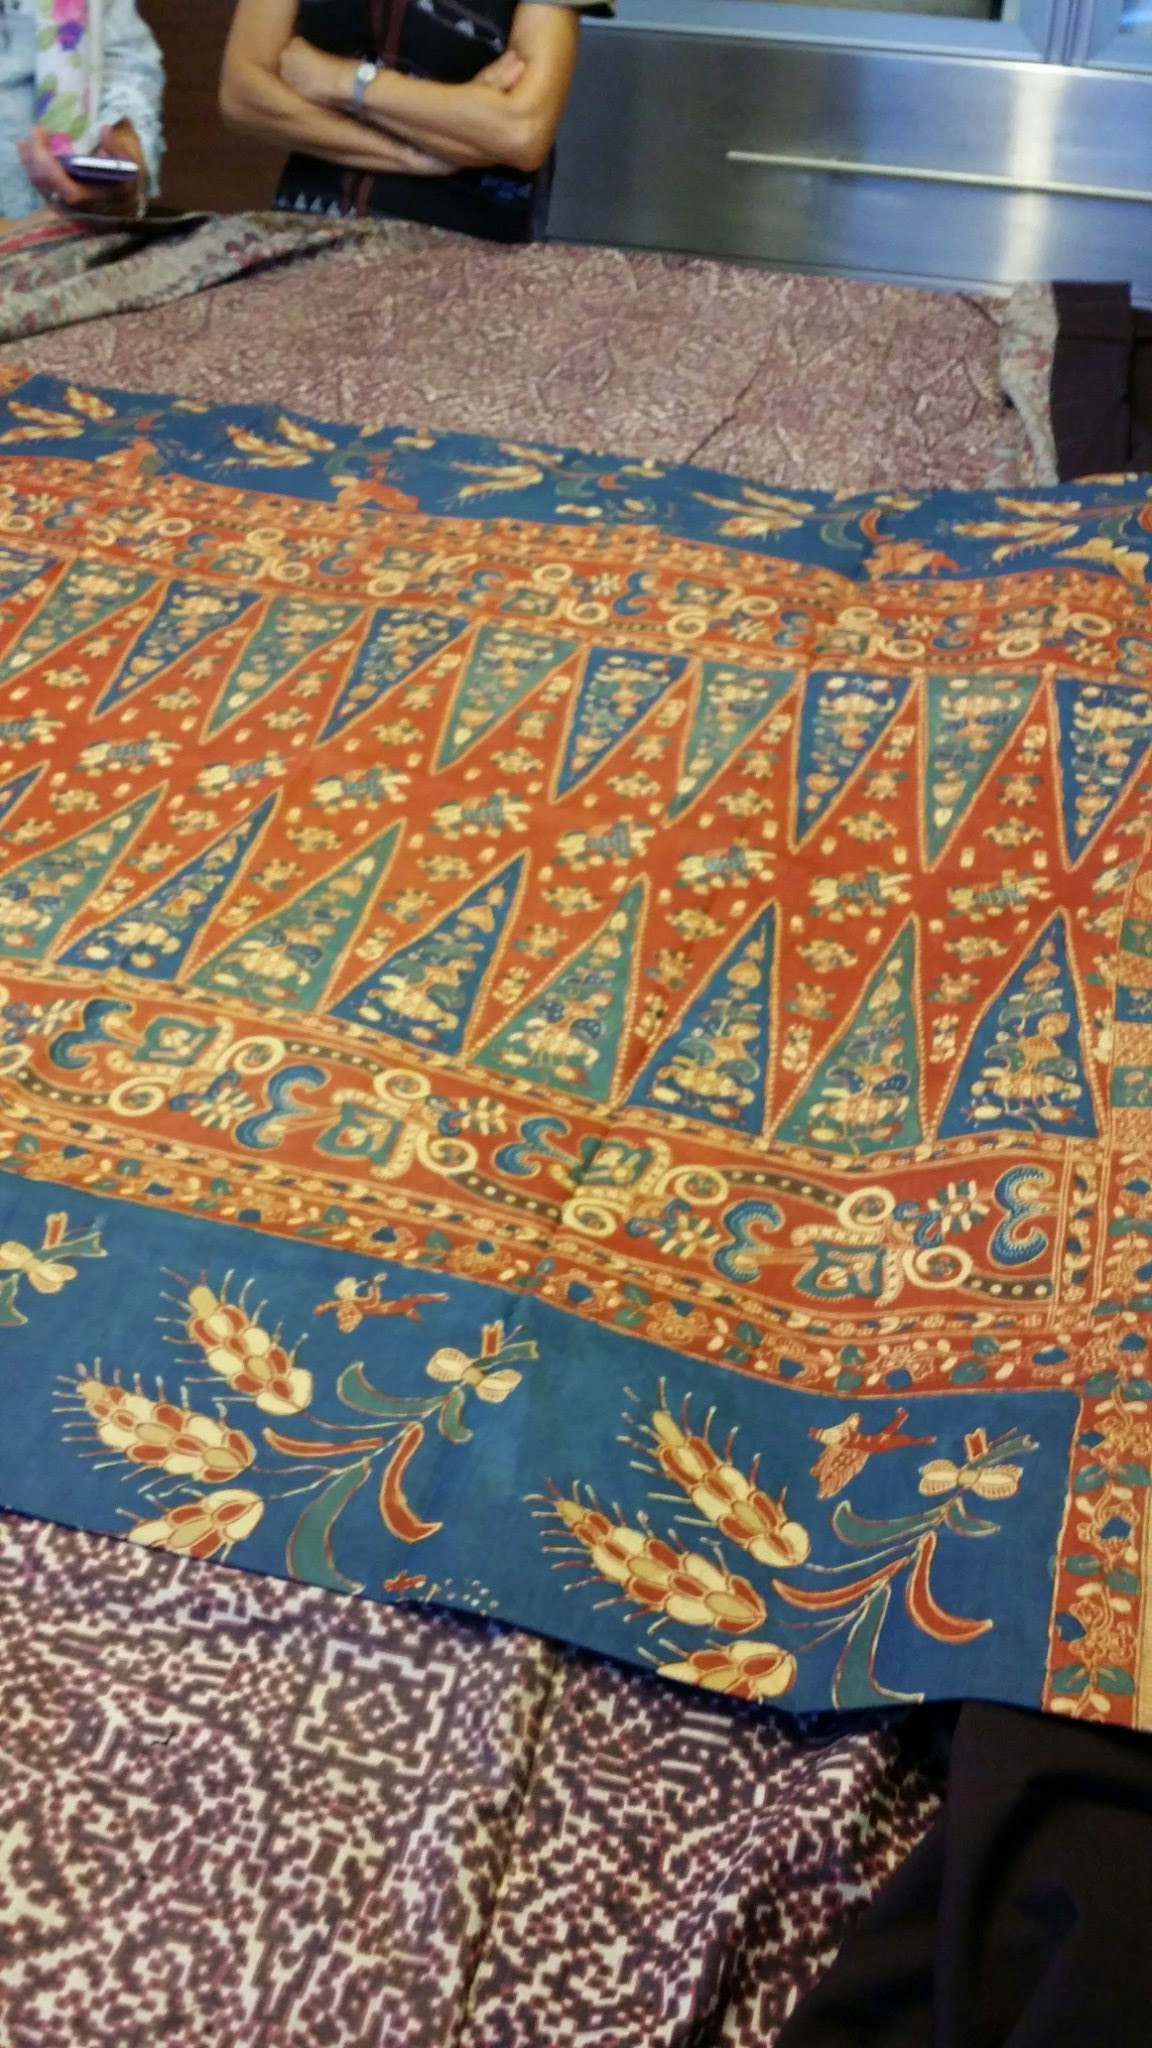 Indian Batik textiles 5.jpg